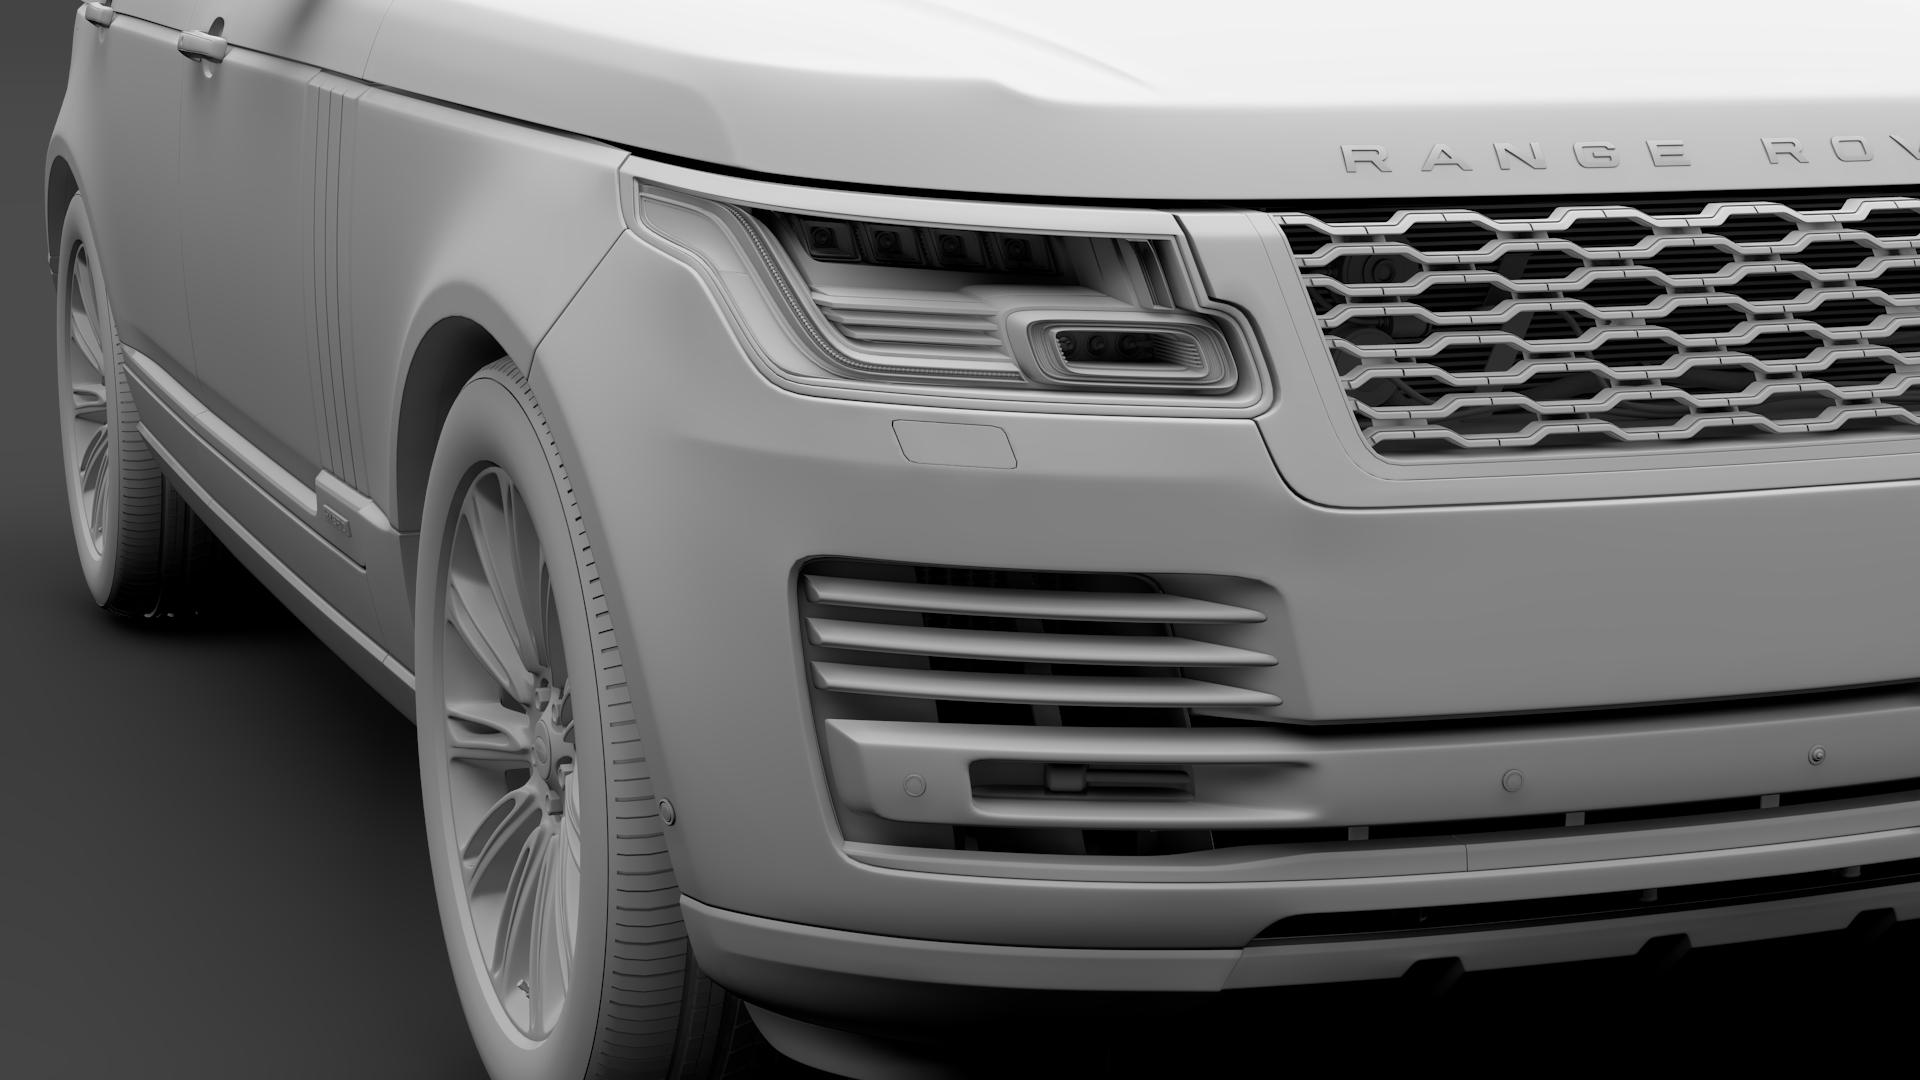 range rover autobiography hybrid lwb l405 2018 3d model max fbx c4d lwo ma mb hrc xsi obj 277306